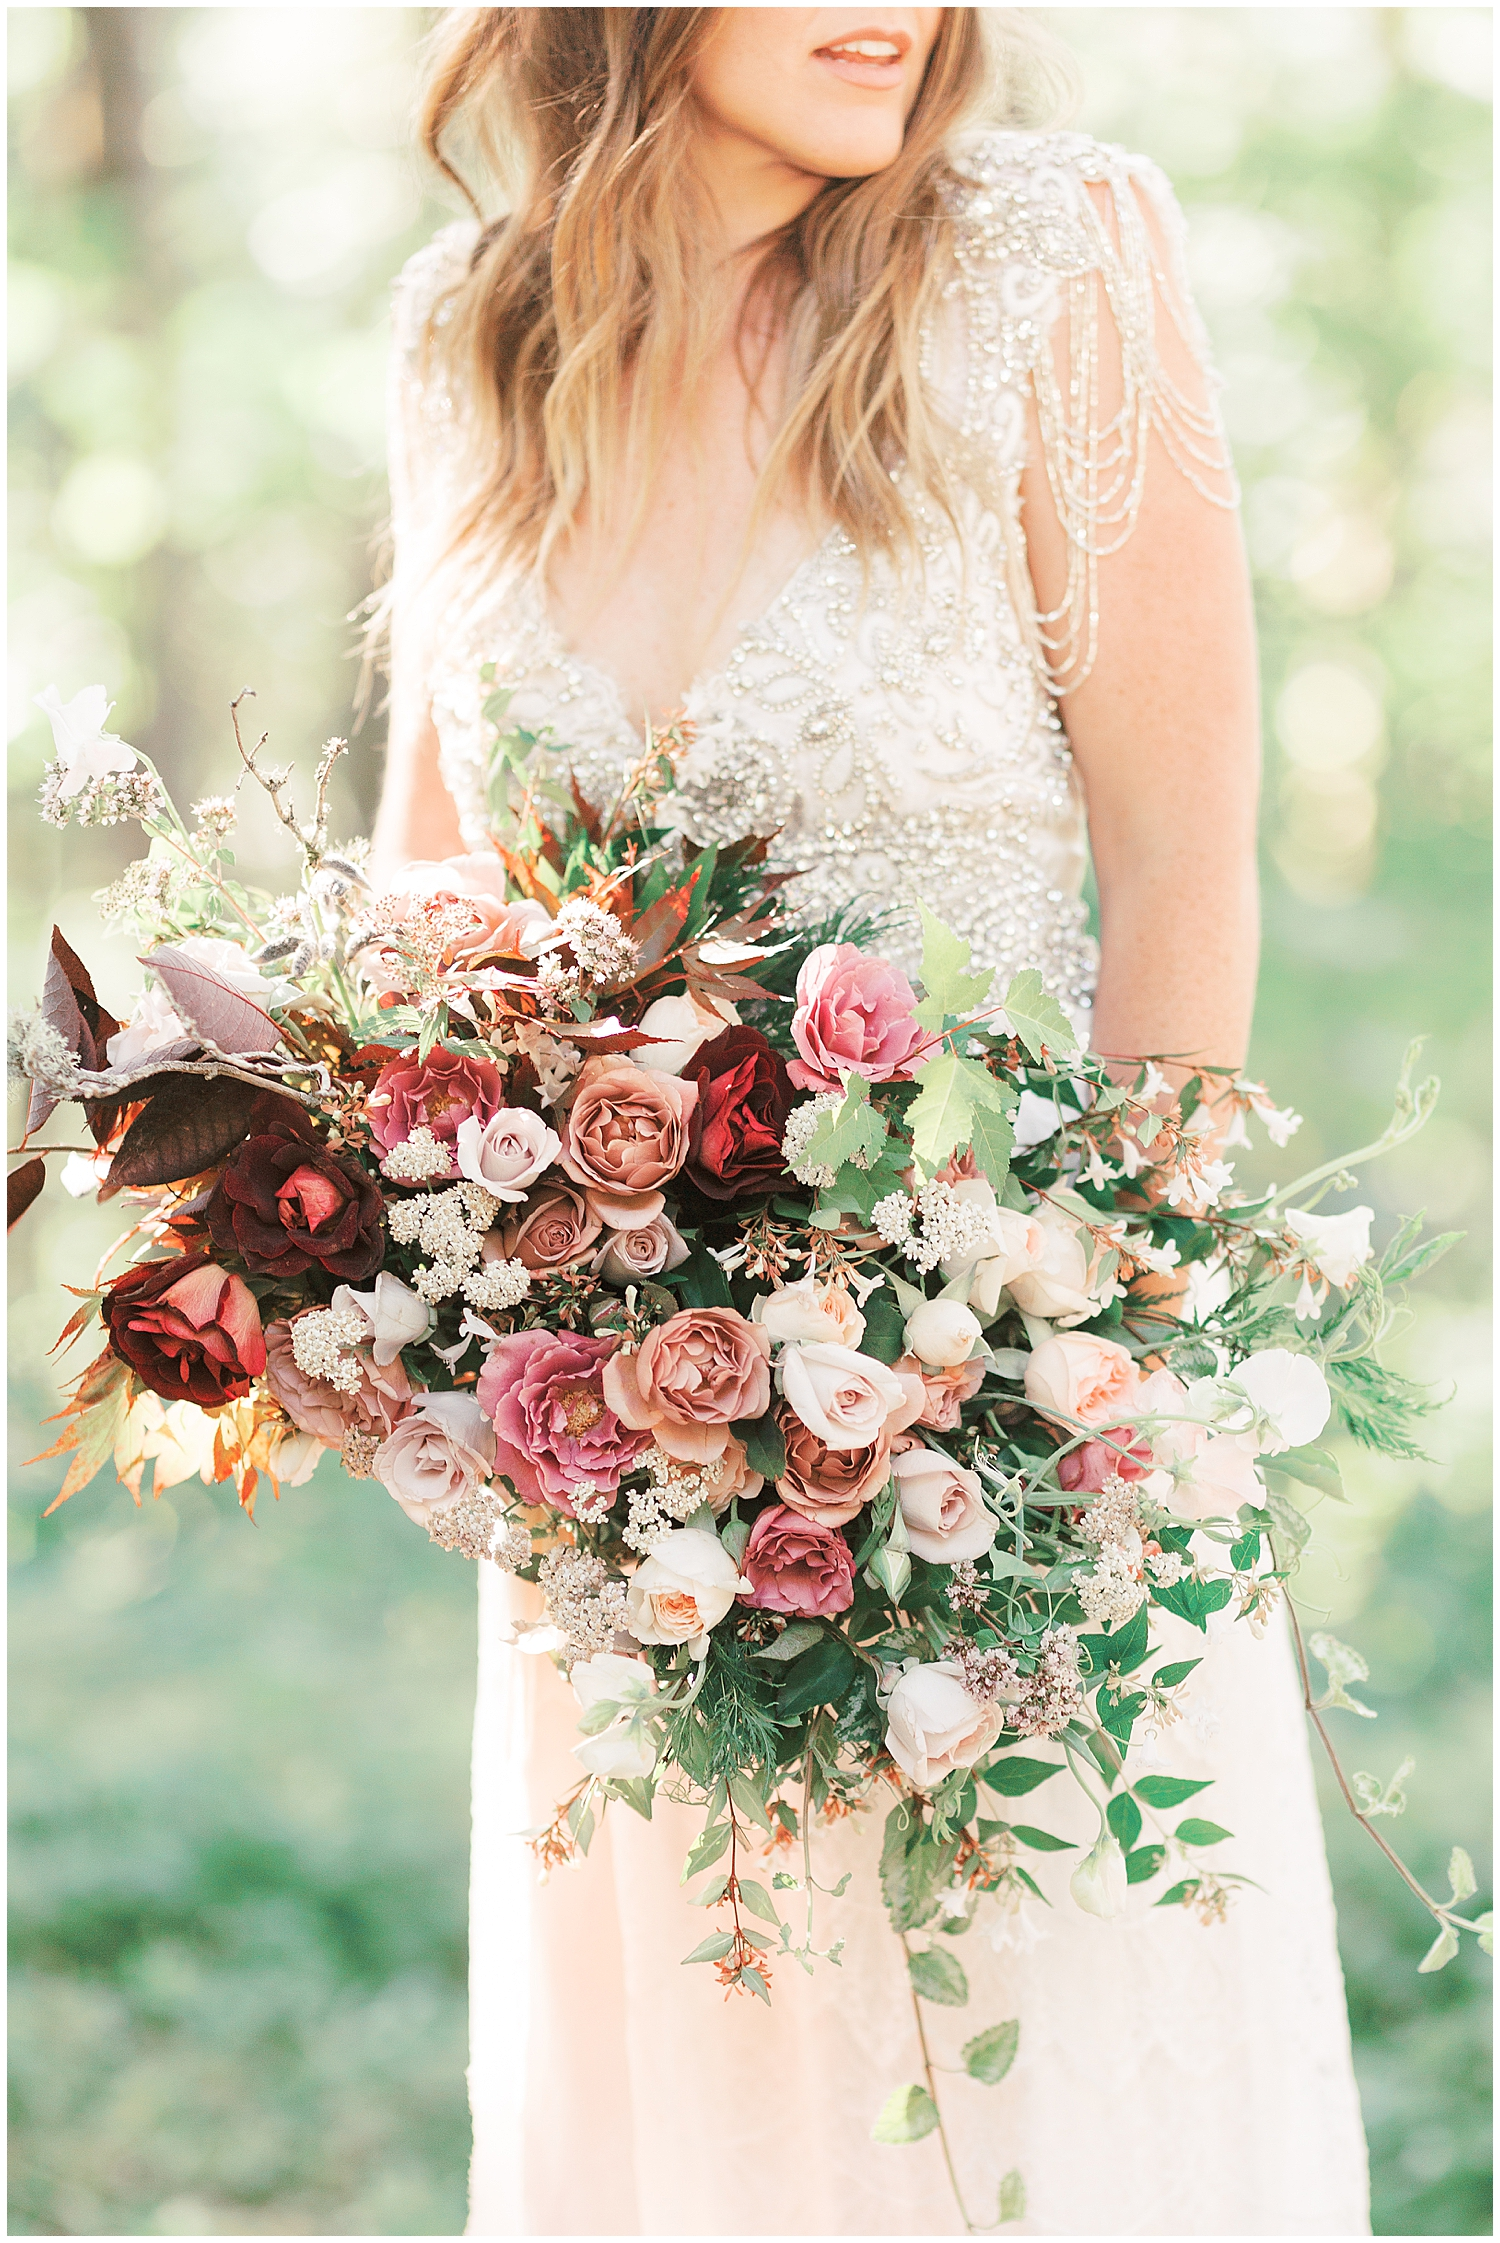 Revel Petals Wedding Bouquet | Latourell Falls Oregon Elopement Wedding Pictures Photography | Waterfall Wedding Pictures | Sam Areman Photo